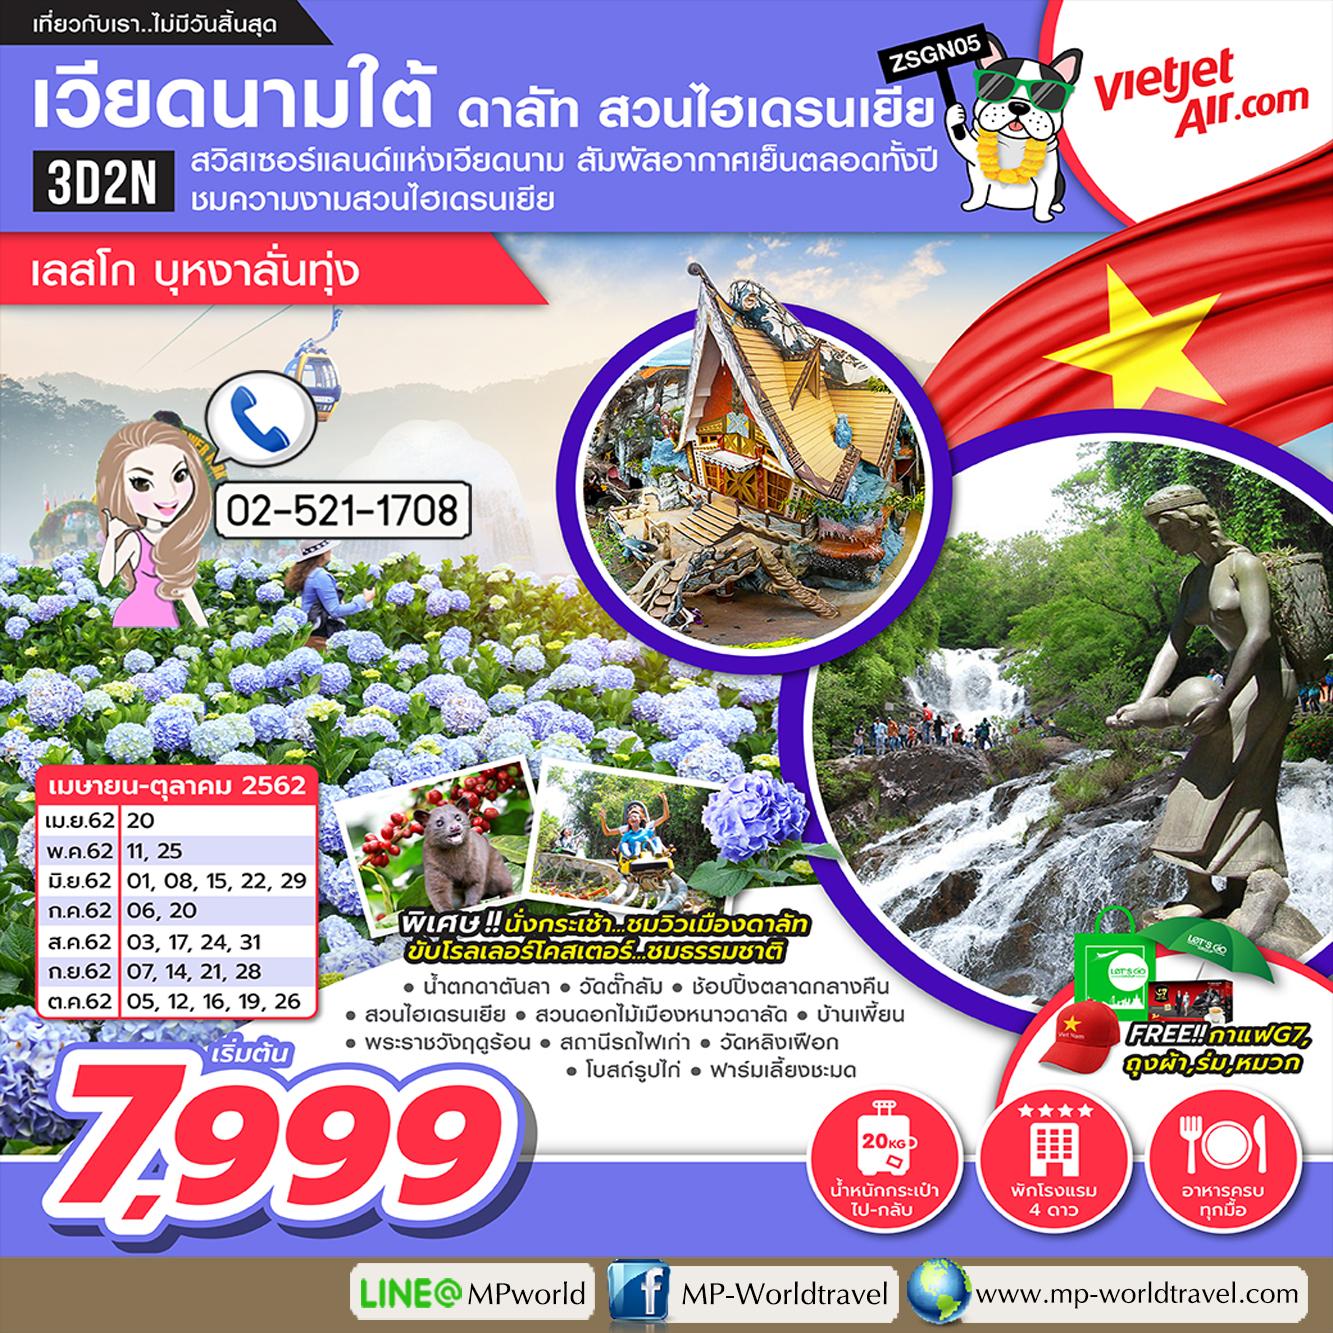 ZSGN05 เวียดนามใต้ ดาลัด ไฮเดรนเยีย [เลสโก บุหงาลั่นทุ่ง] 3วัน 2คืน